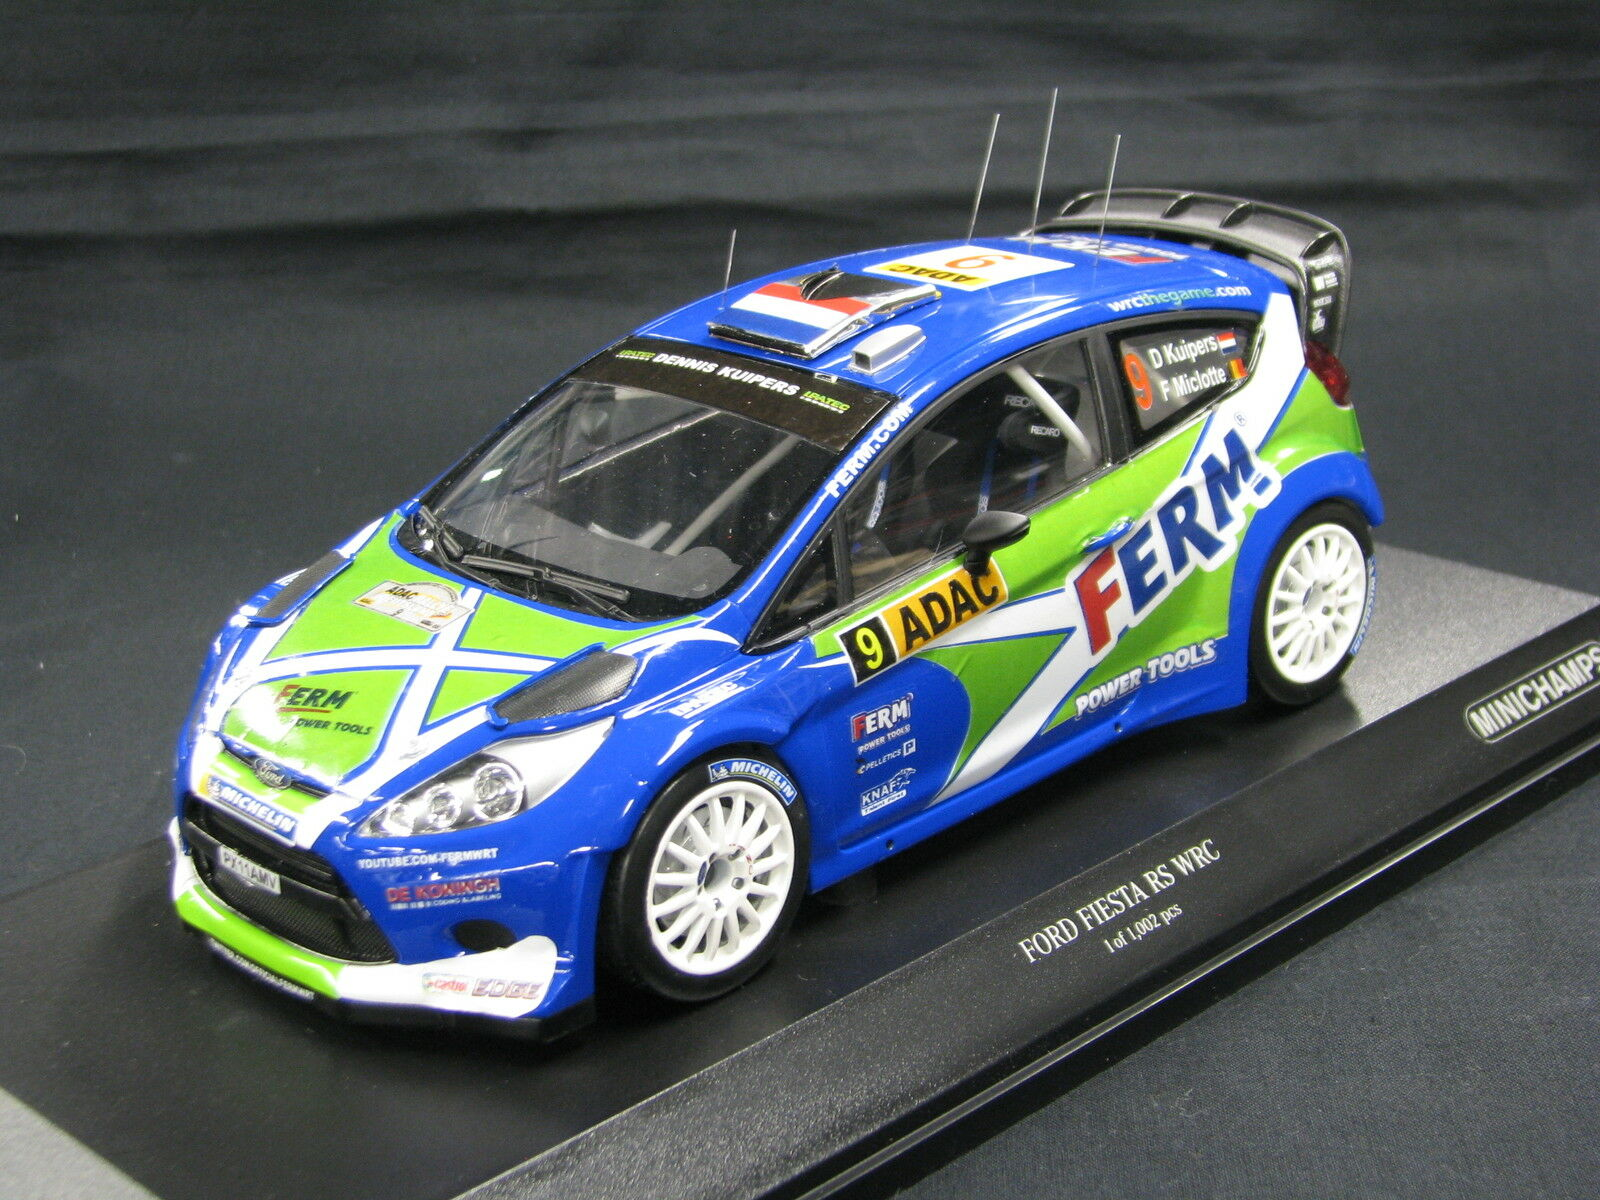 Minichamps Ford Fiesta WRC 2011 1 18  9 Kuipers   Miclotte Deutschland (MCC)